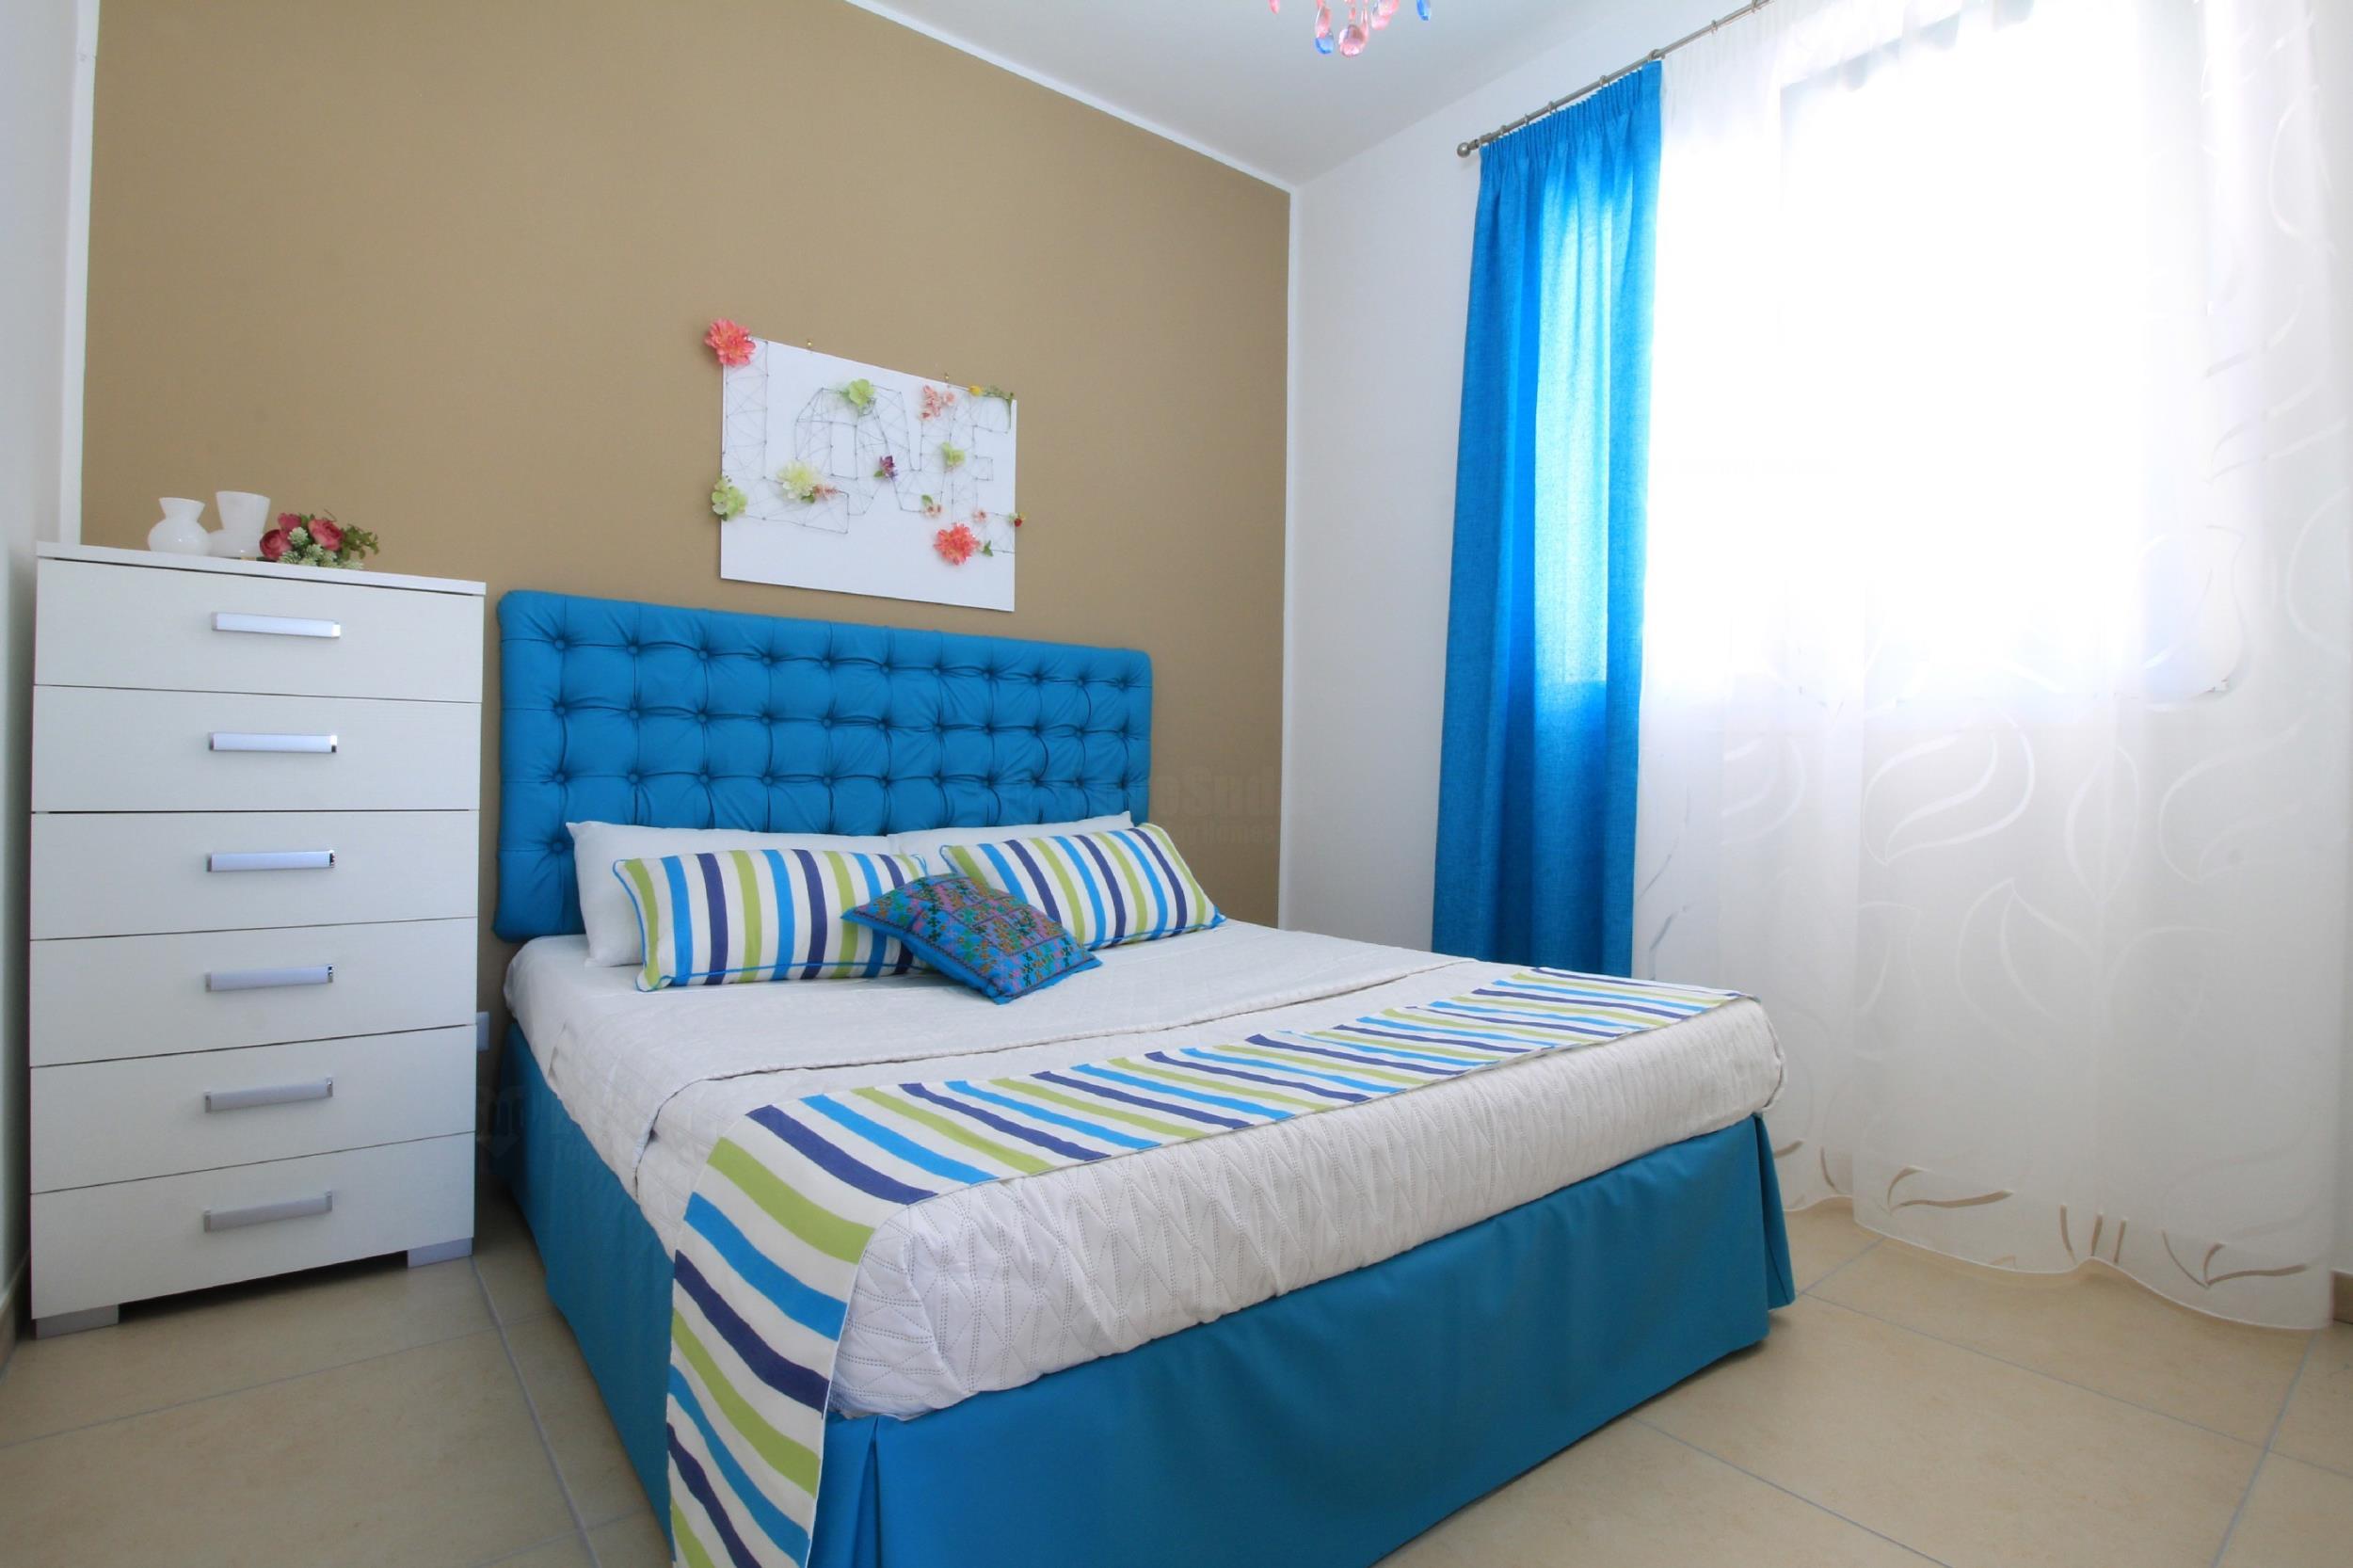 Apartment Elcisia luxe beach house photo 23457101